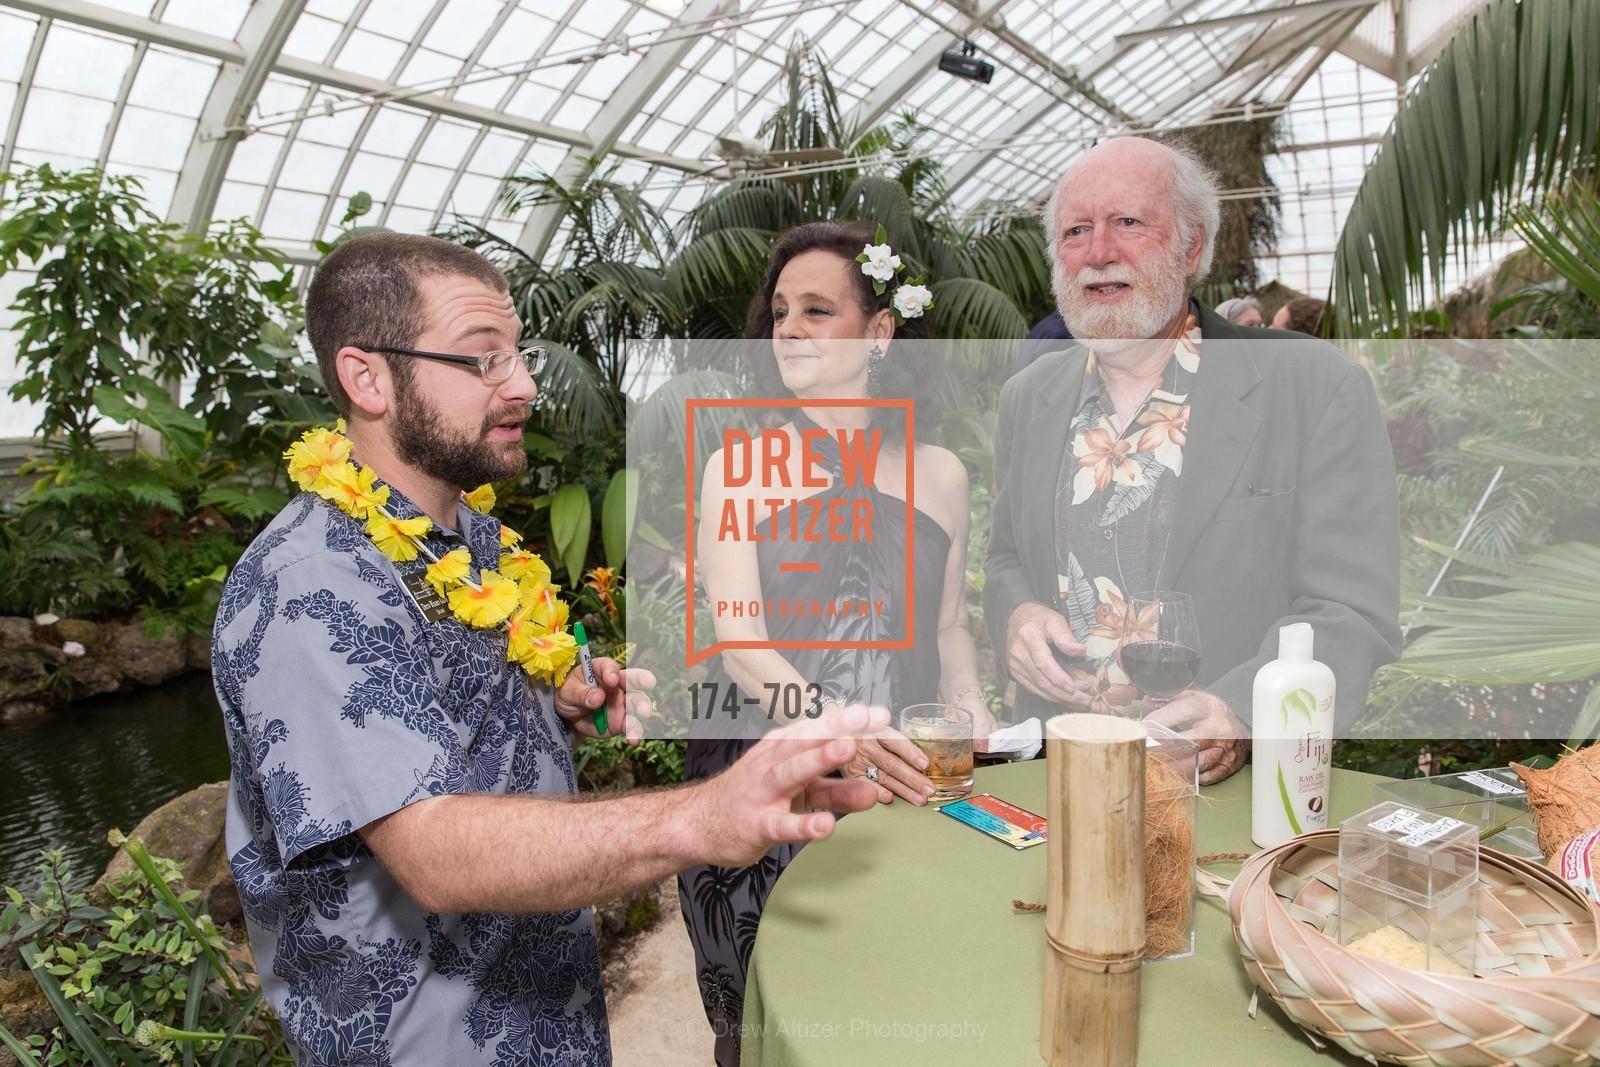 Drew Risner-Davis, Suzanne Miller, Michael Miller, CONSERVATORY OF FLOWERS Presents